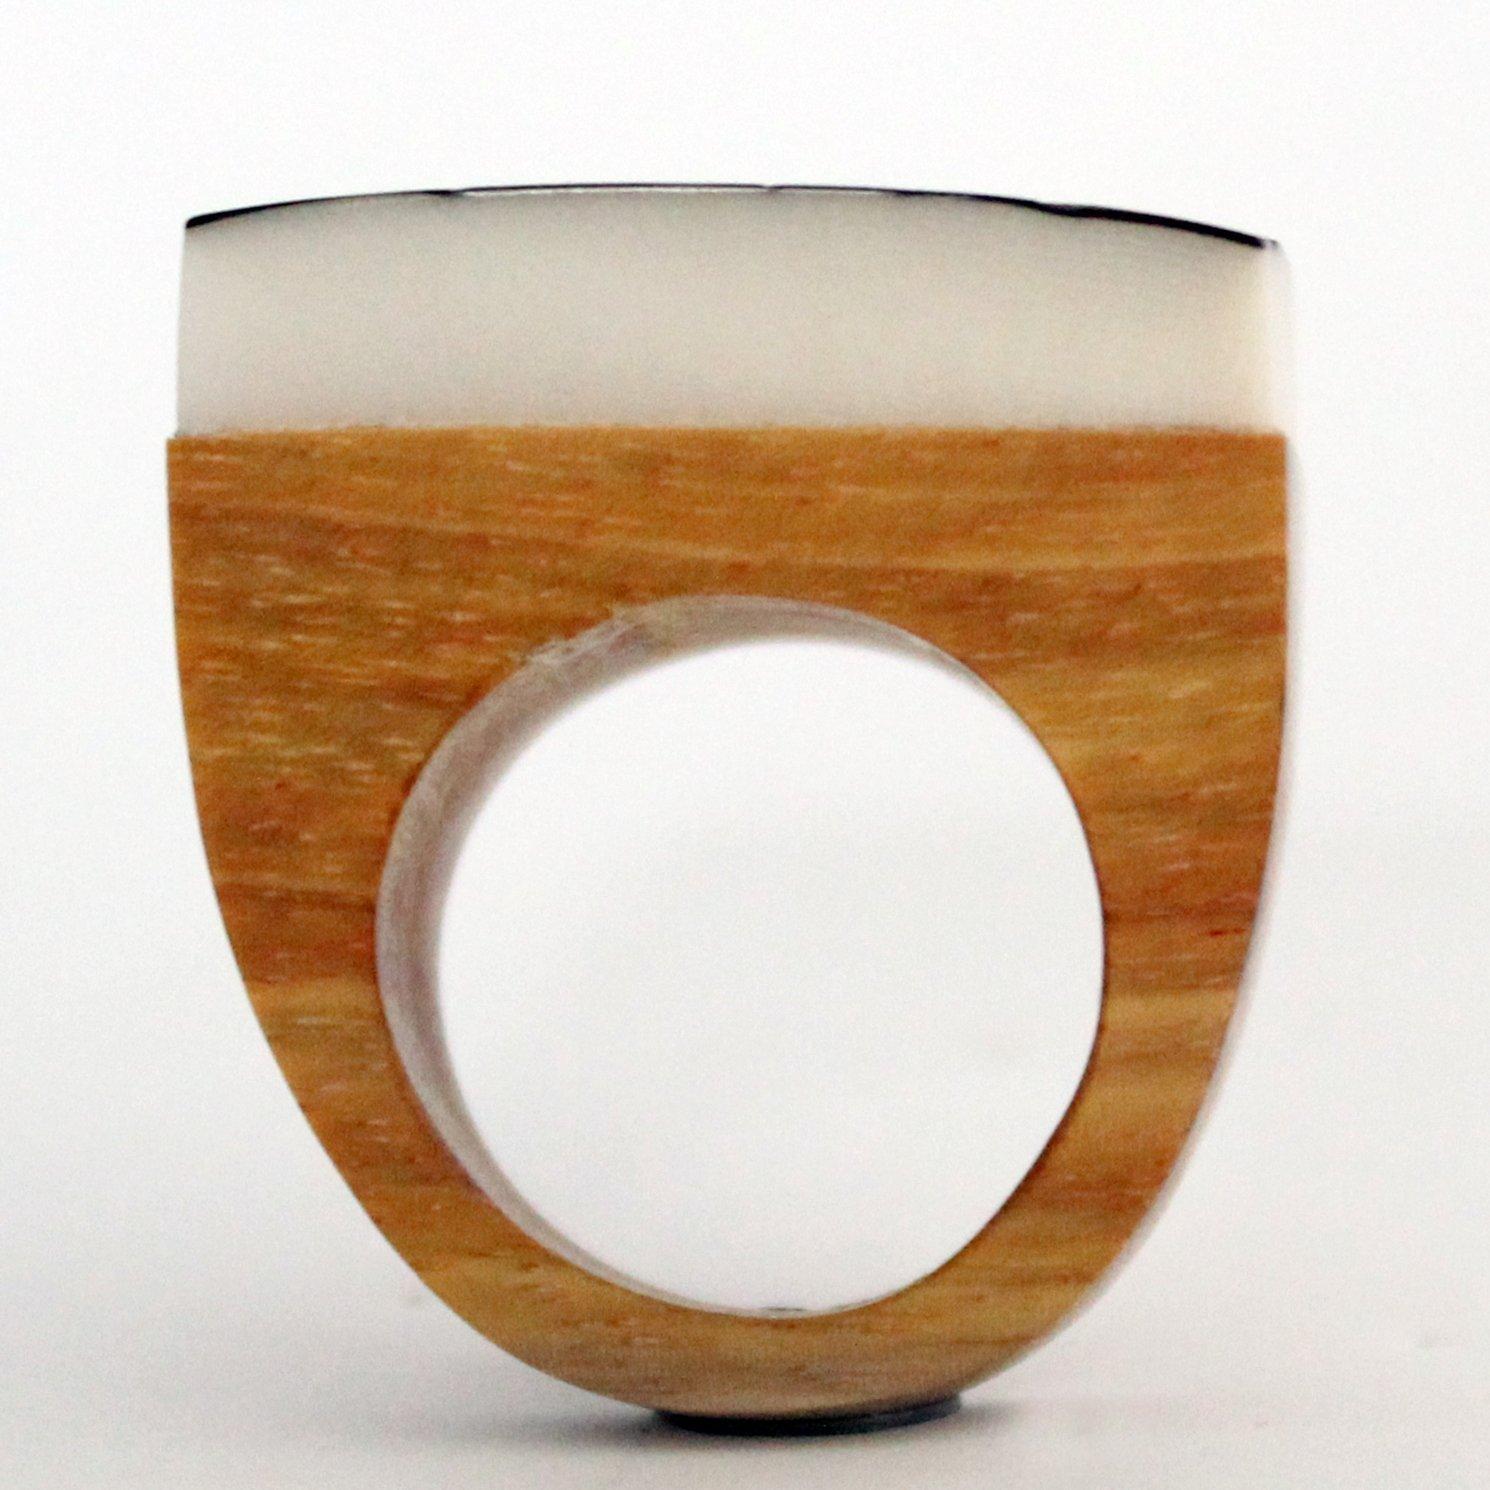 Orange Tagua Nut Ring TAG805 Eco-Friendly Tagua Ring Organic Ring in Orange